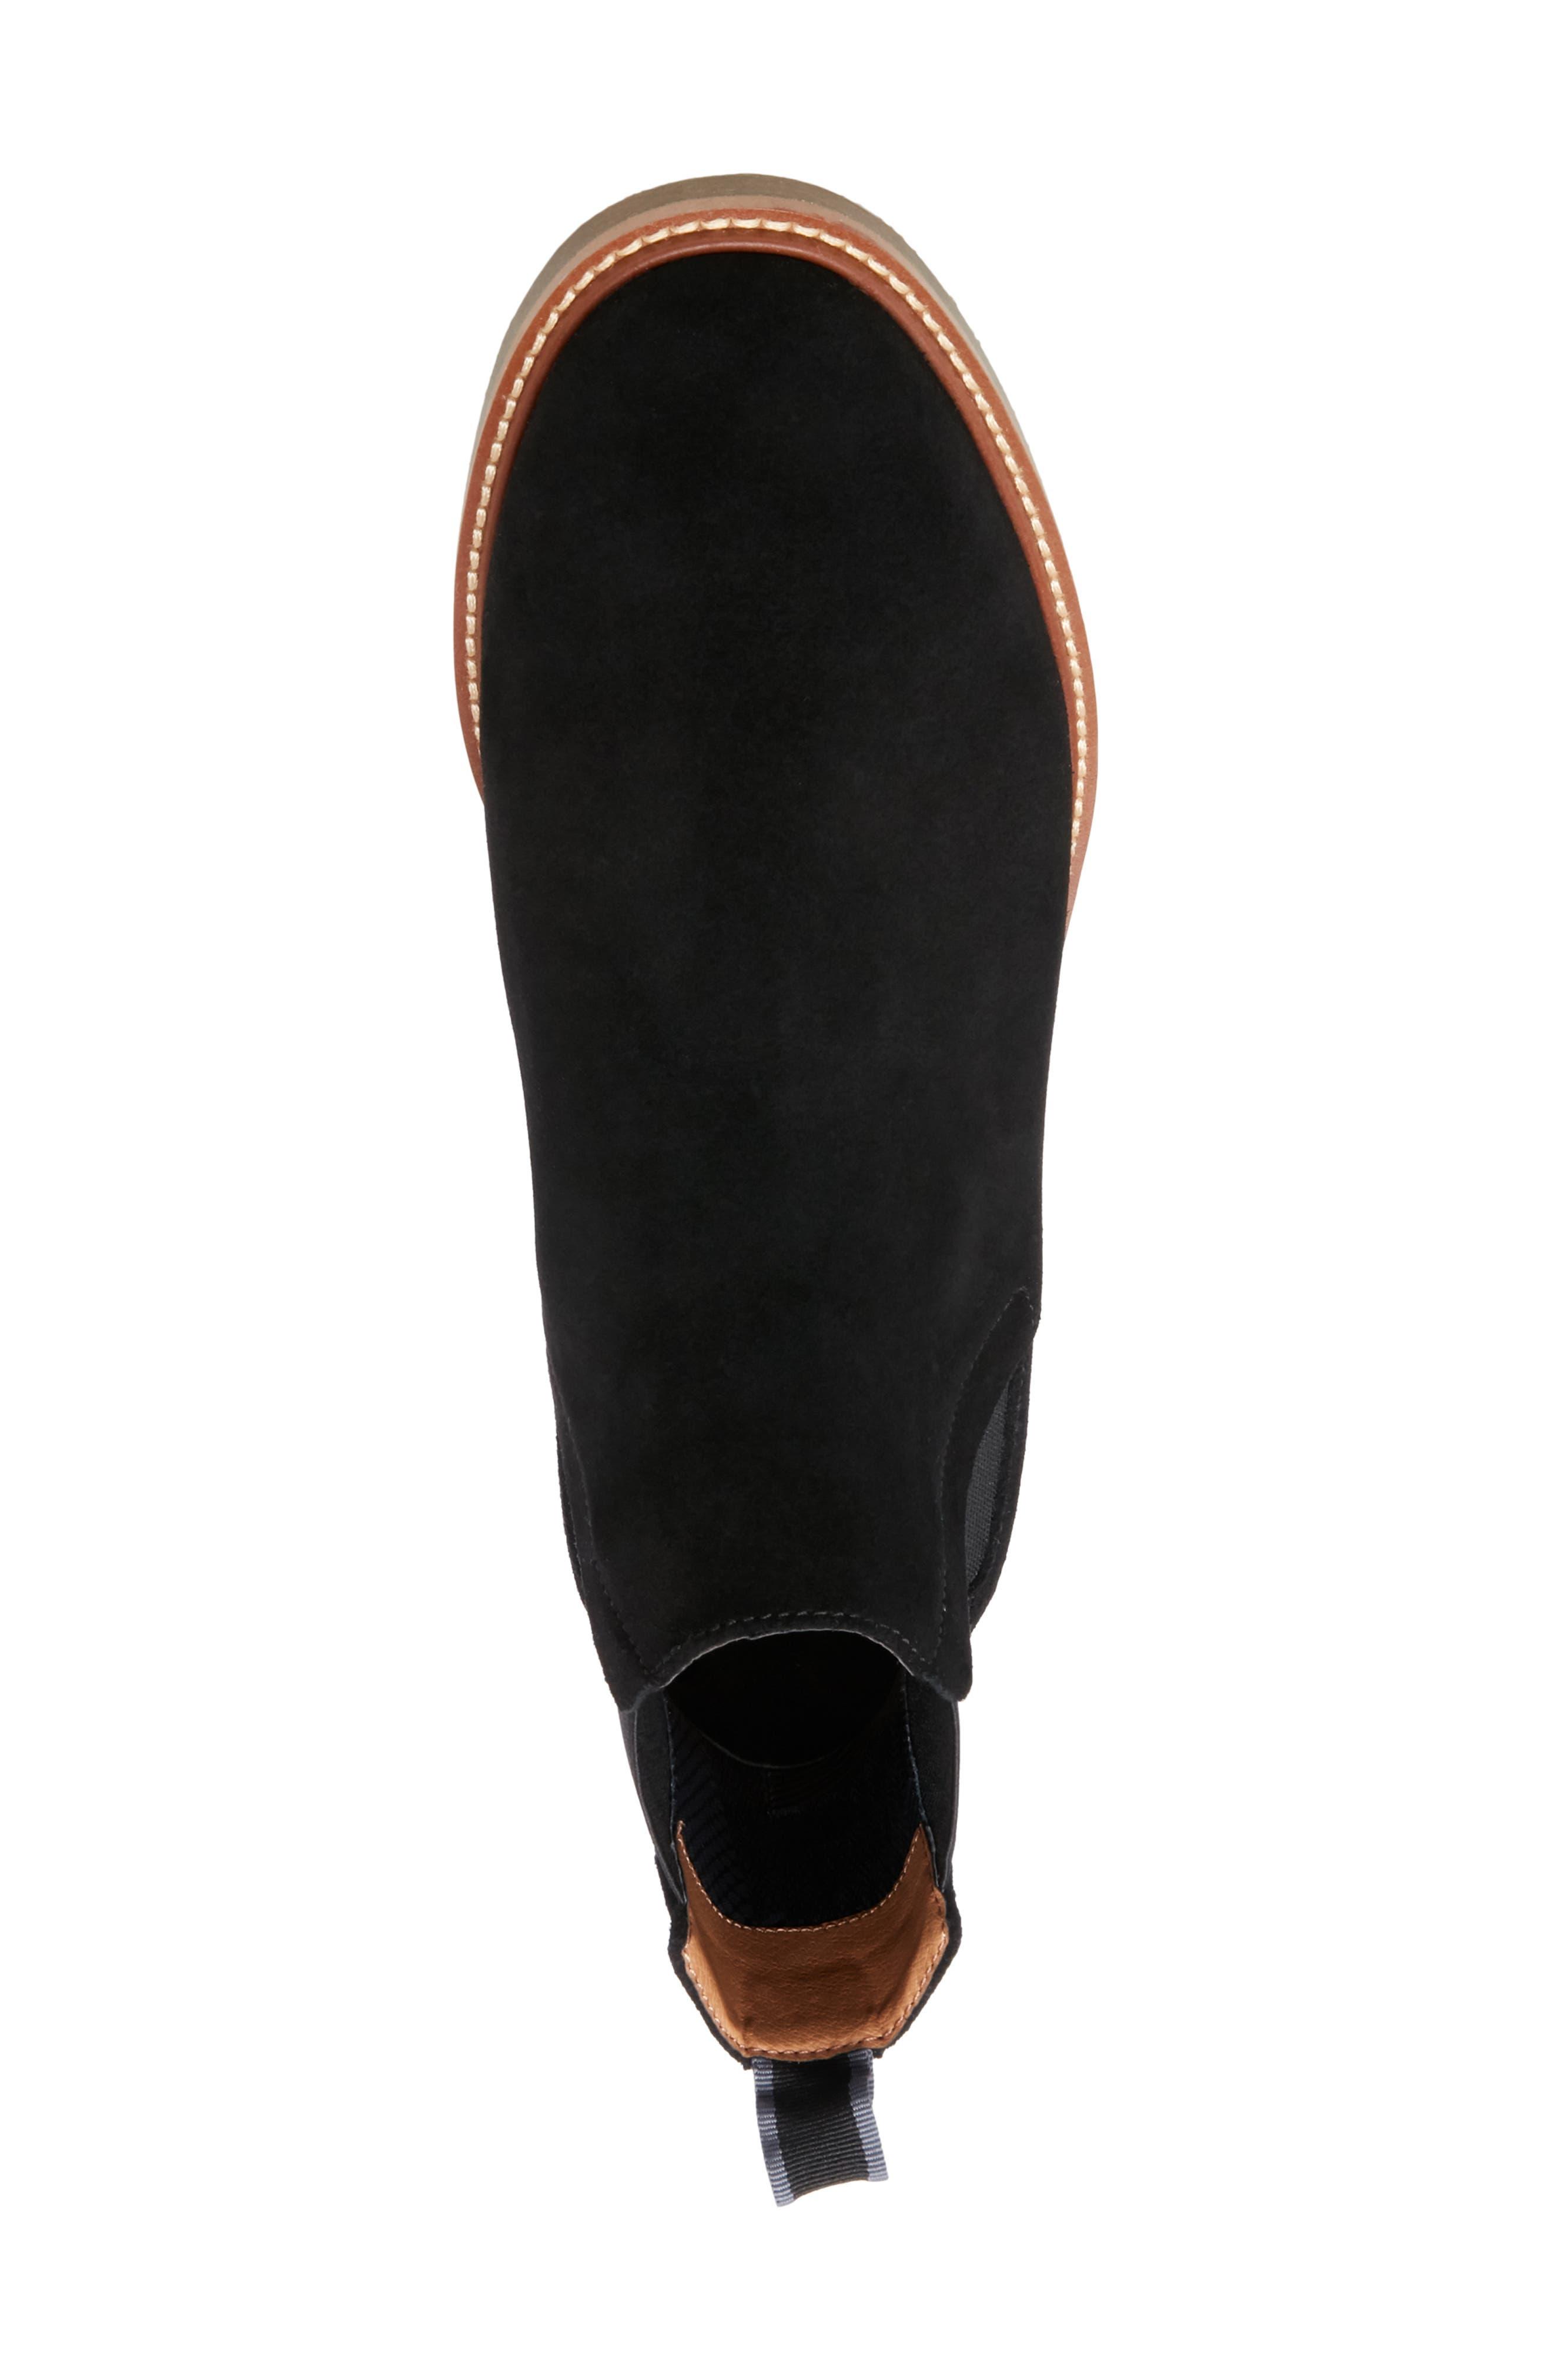 STEVE MADDEN, Highlyte Textured Chelsea Boot, Alternate thumbnail 5, color, BLACK SUEDE